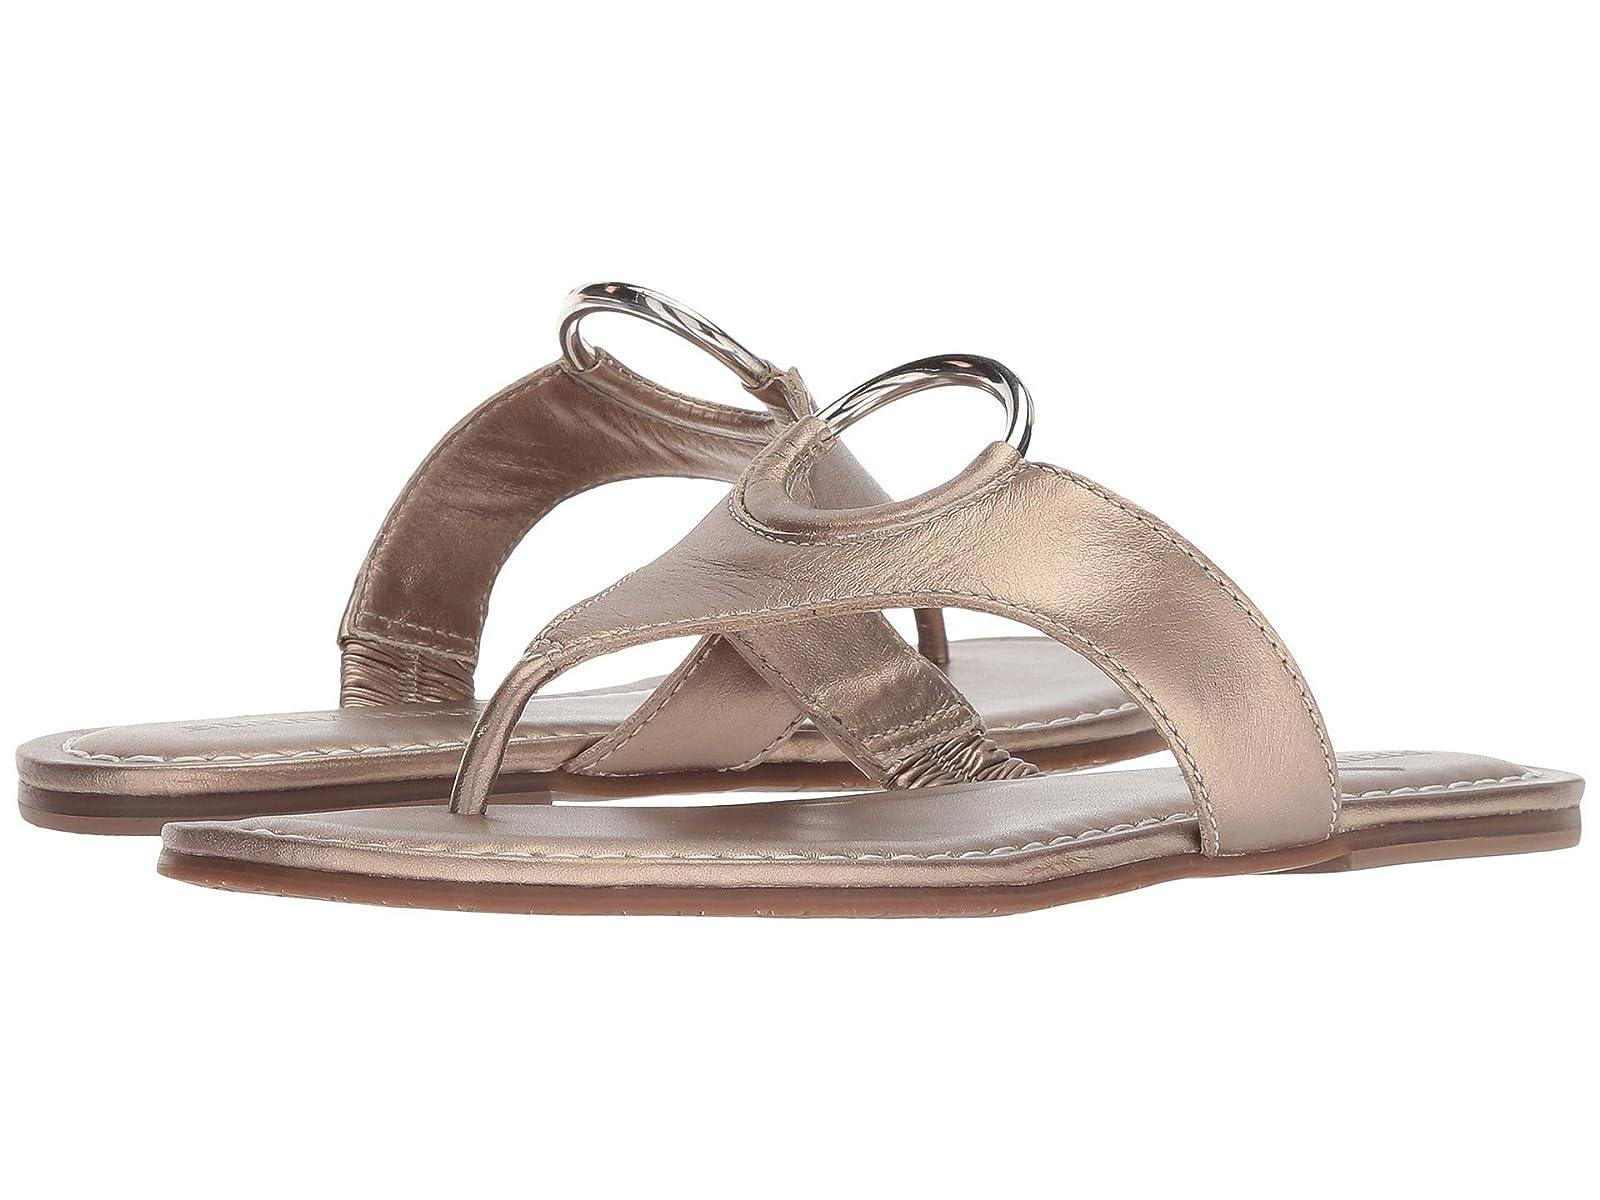 Bernardo Mallory SandalComfortable and distinctive shoes